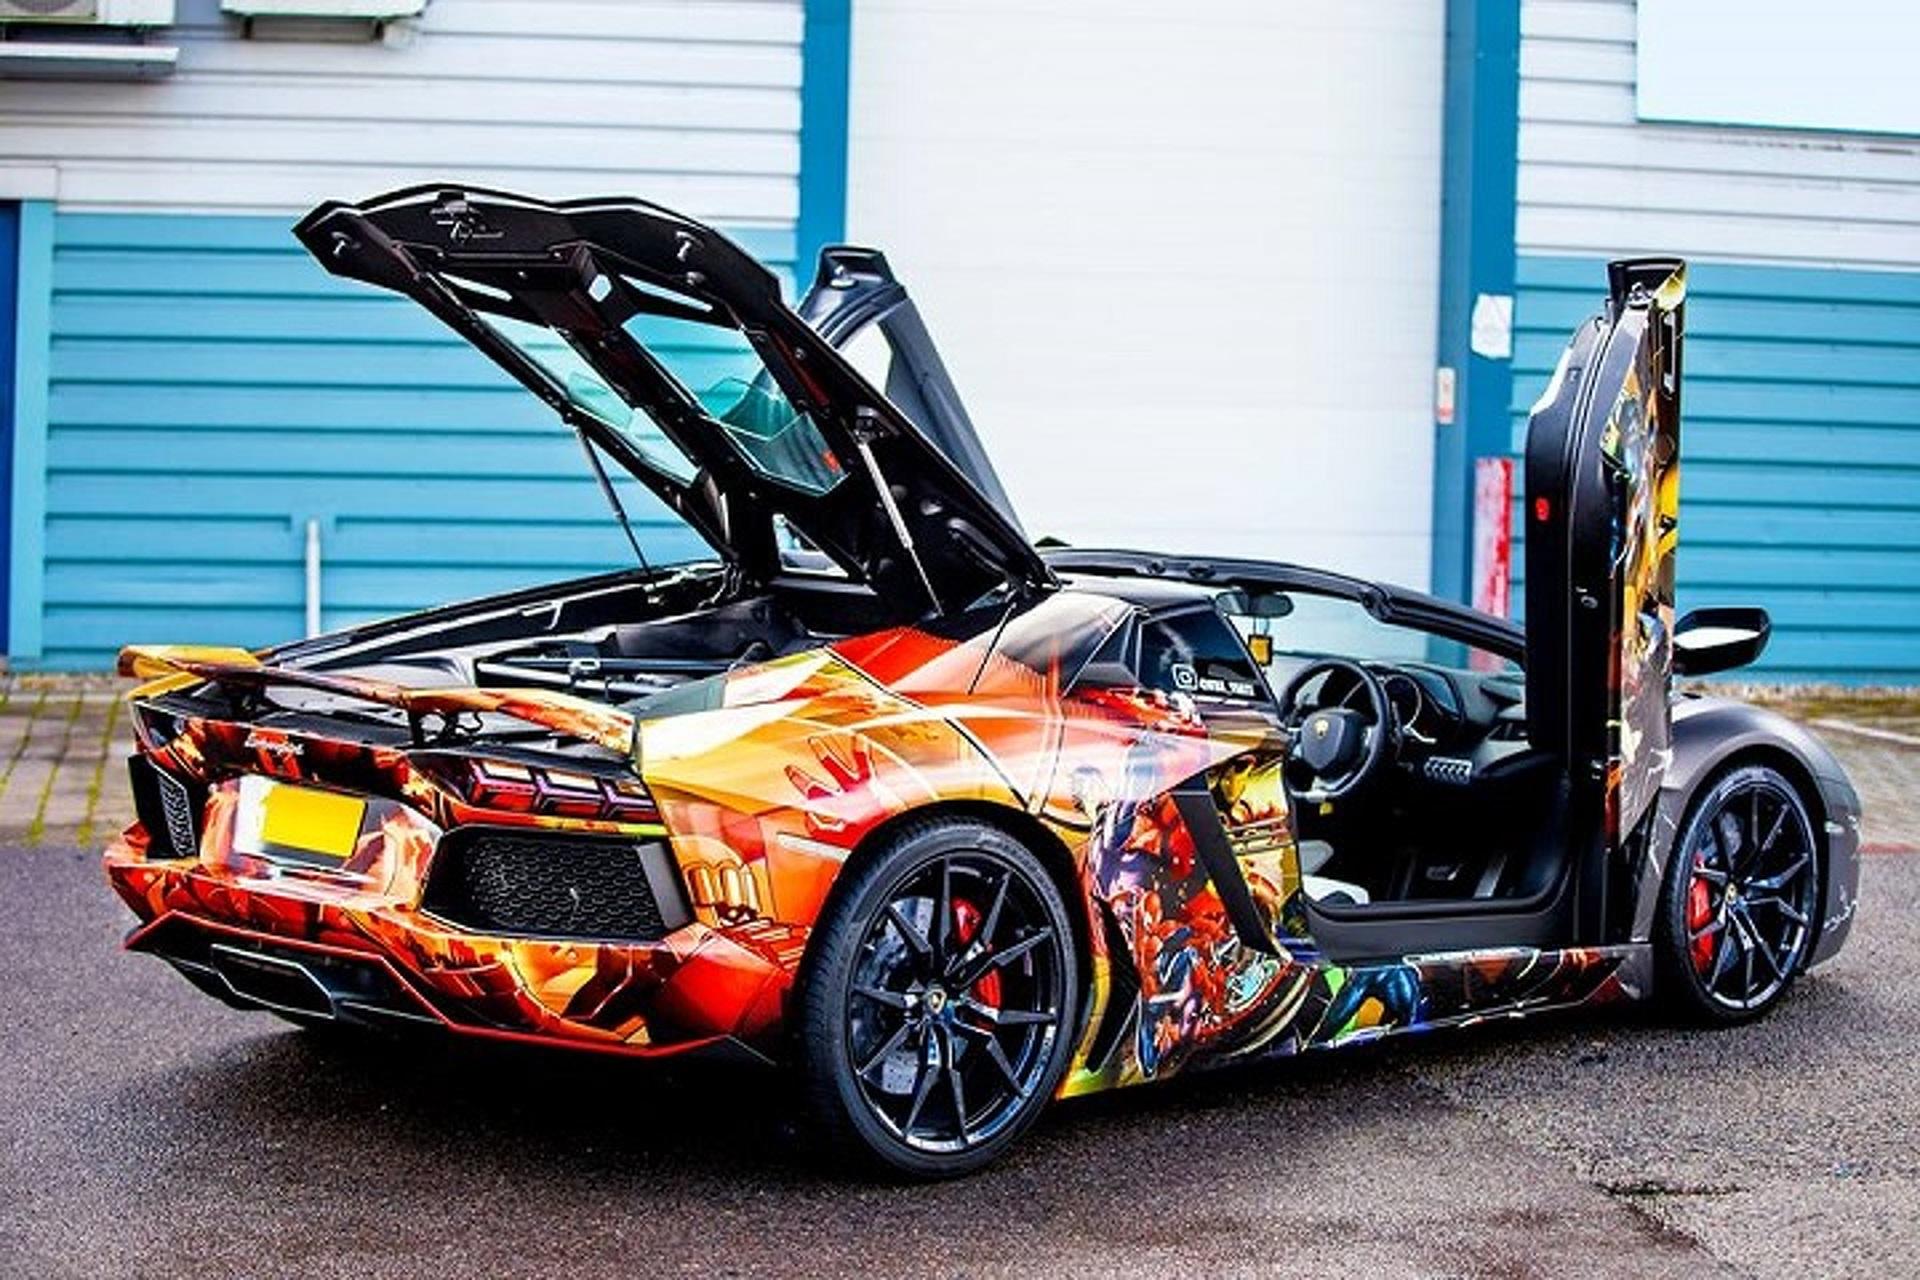 Lamborghini Aventador Gets A Marvel Ous Superhero Wrap